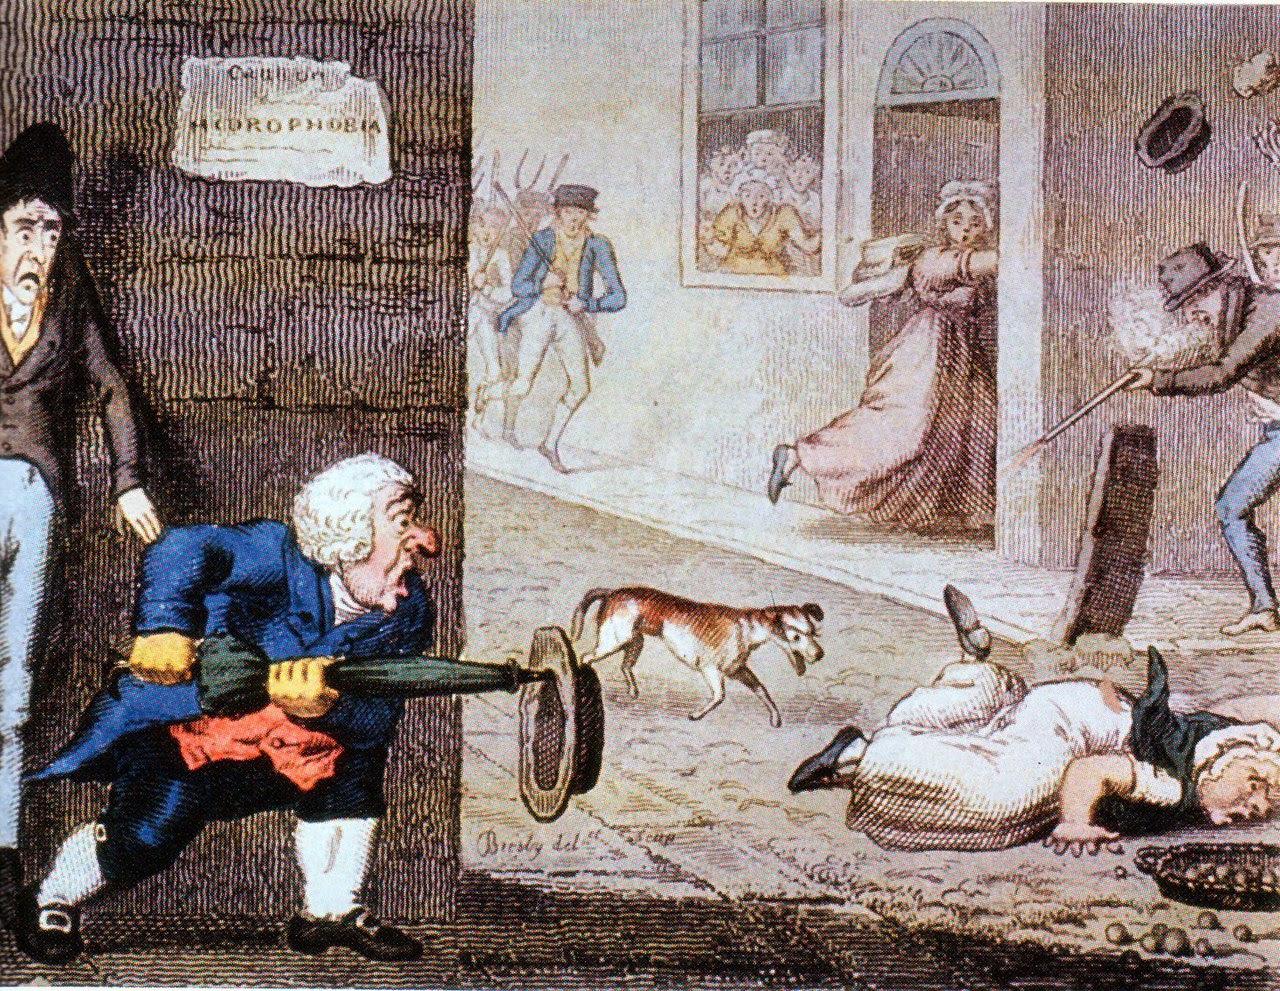 http://upload.wikimedia.org/wikipedia/commons/thumb/a/a7/Rabies_cartoon_circa_1826.jpg/1280px-Rabies_cartoon_circa_1826.jpg